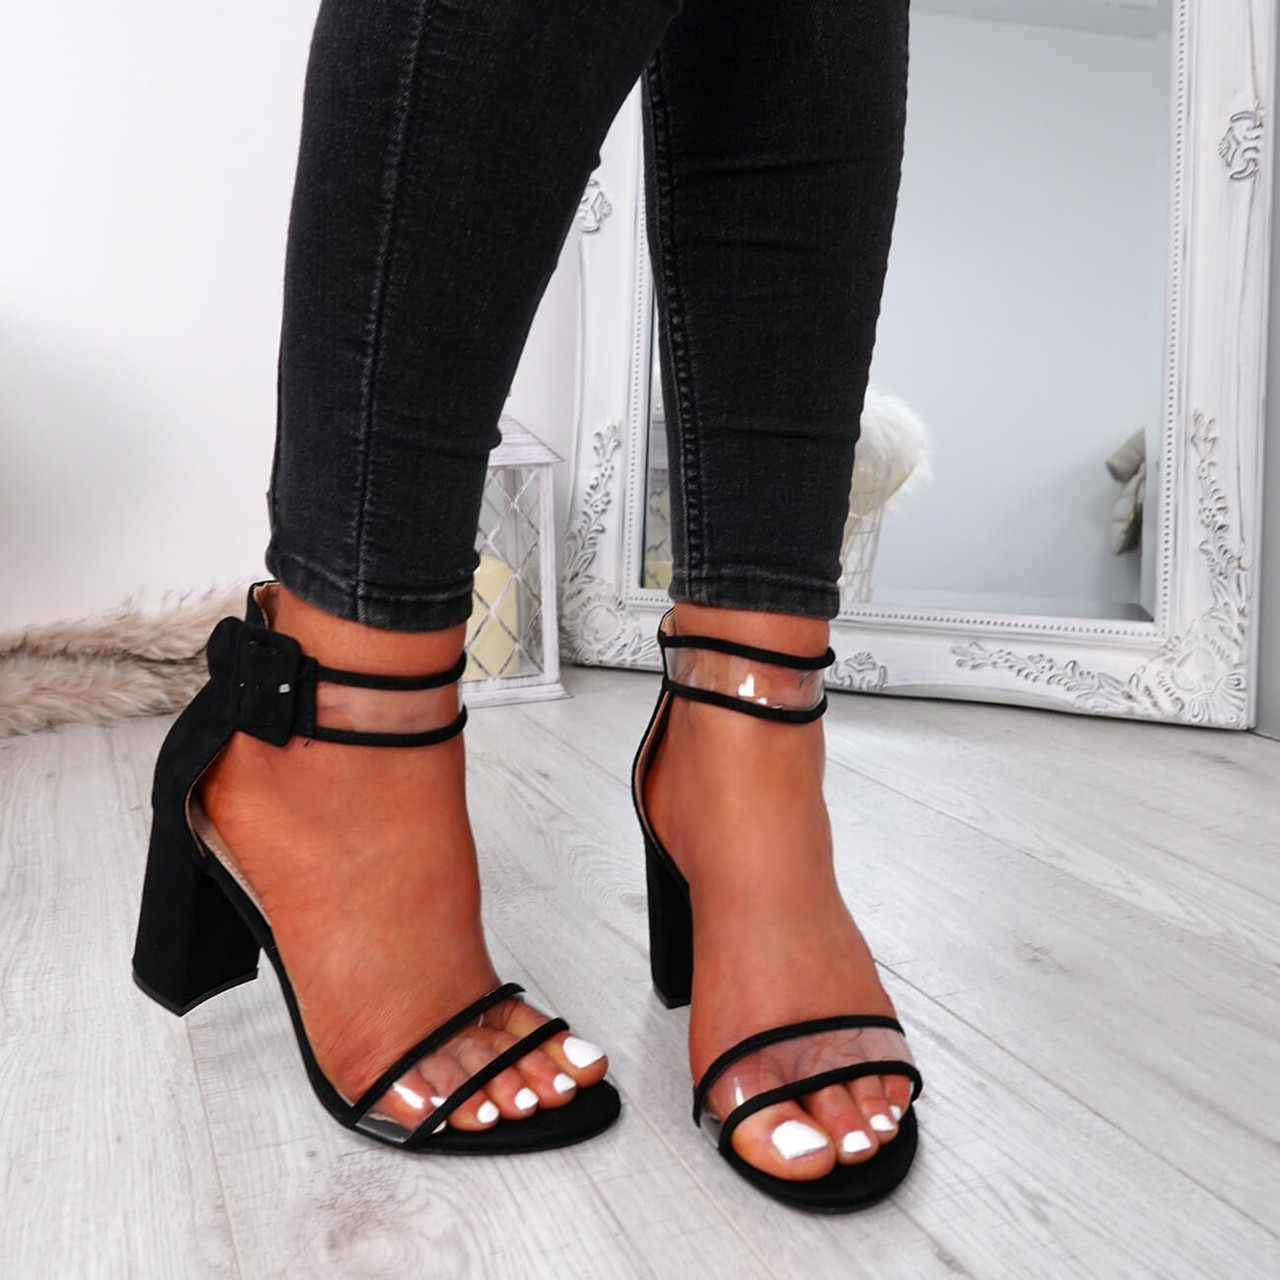 black peep toe shoes uk